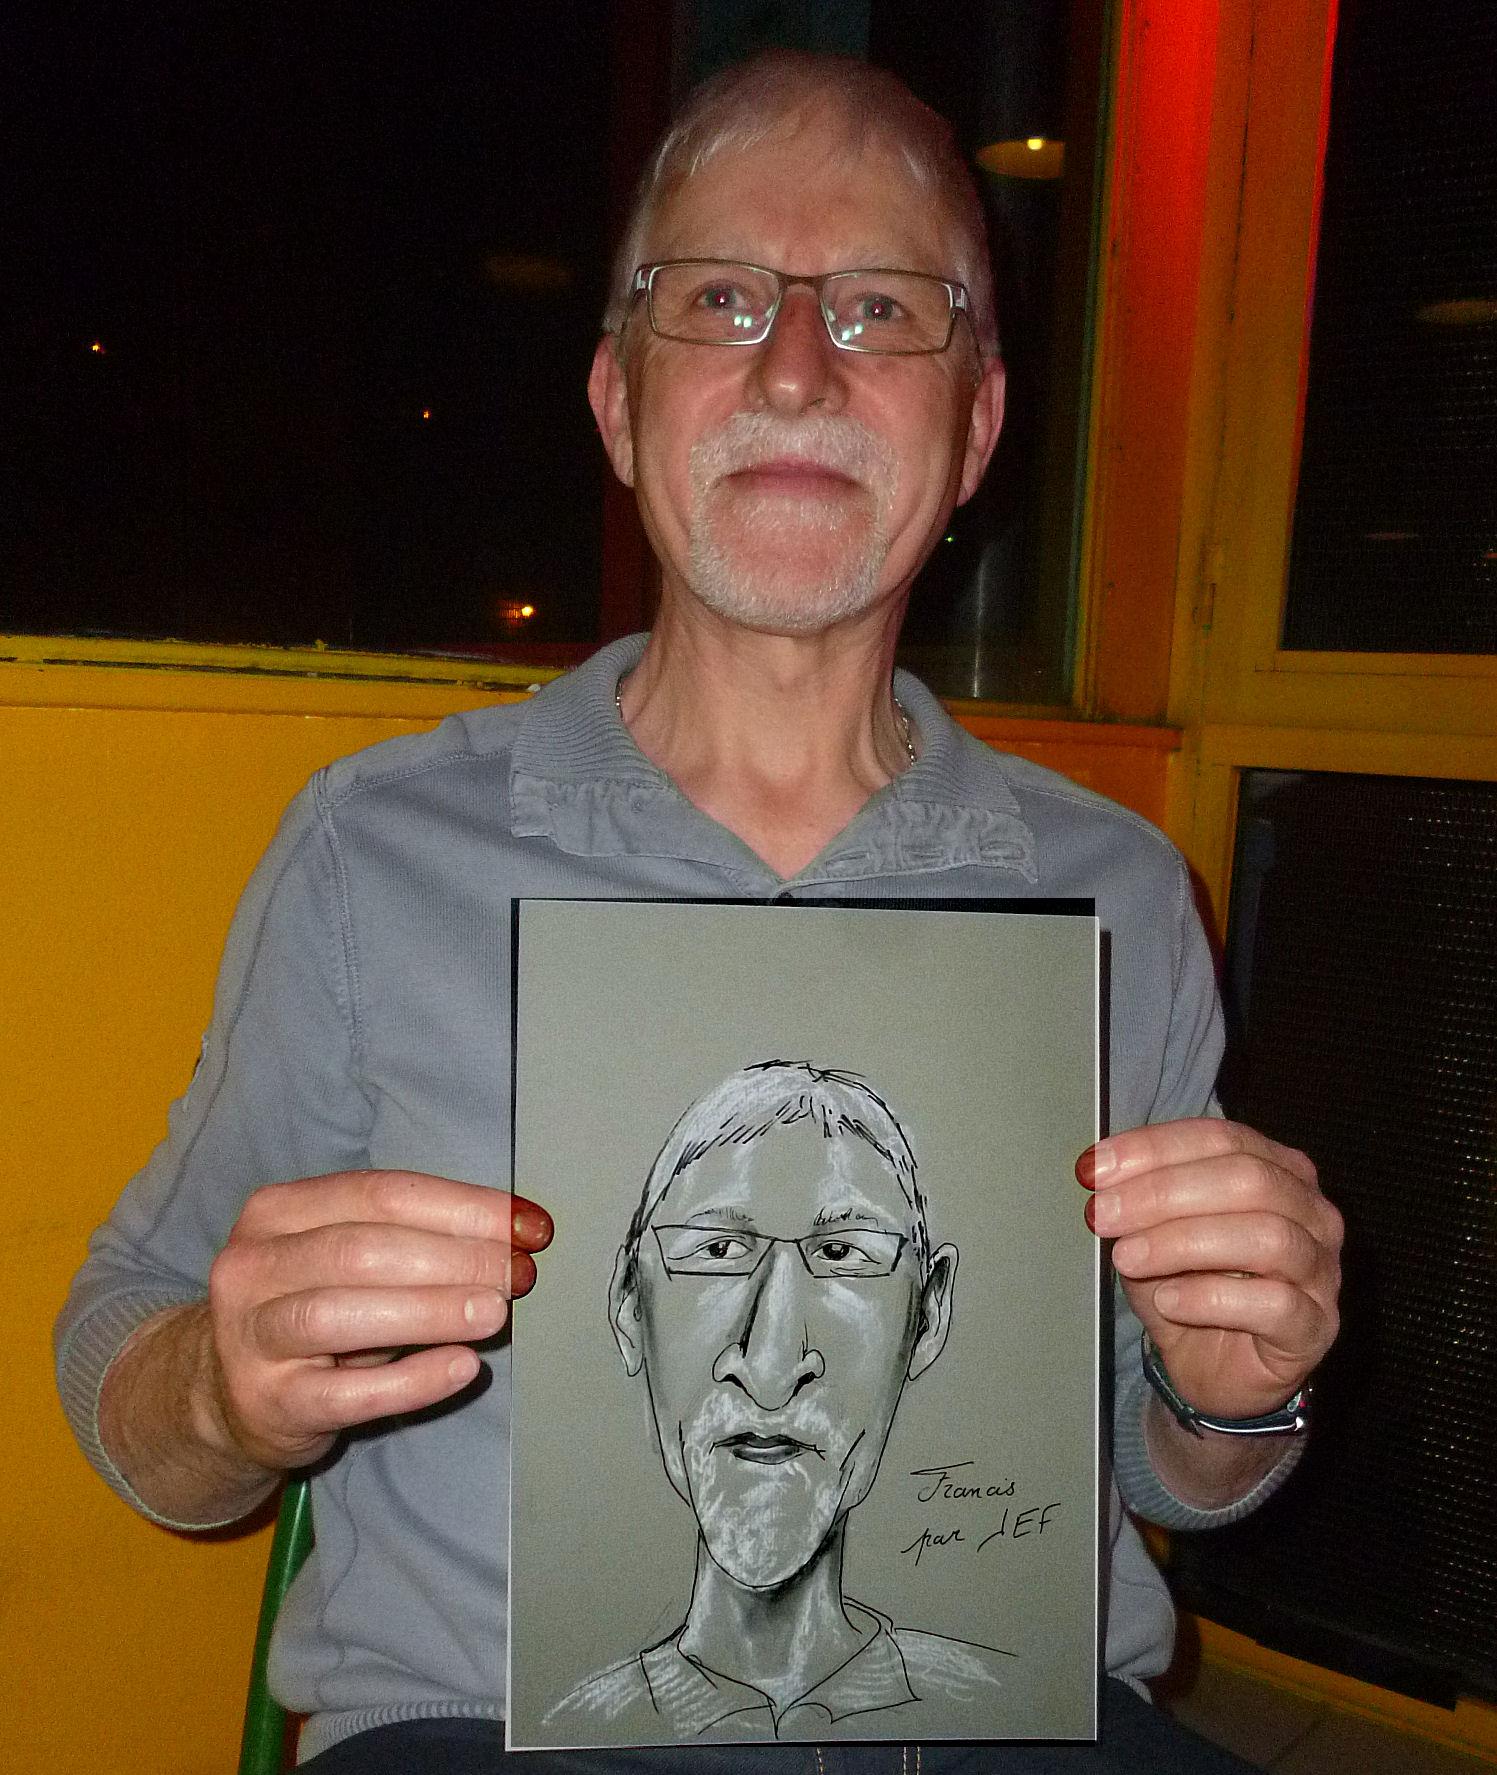 Francis caricature de JEF